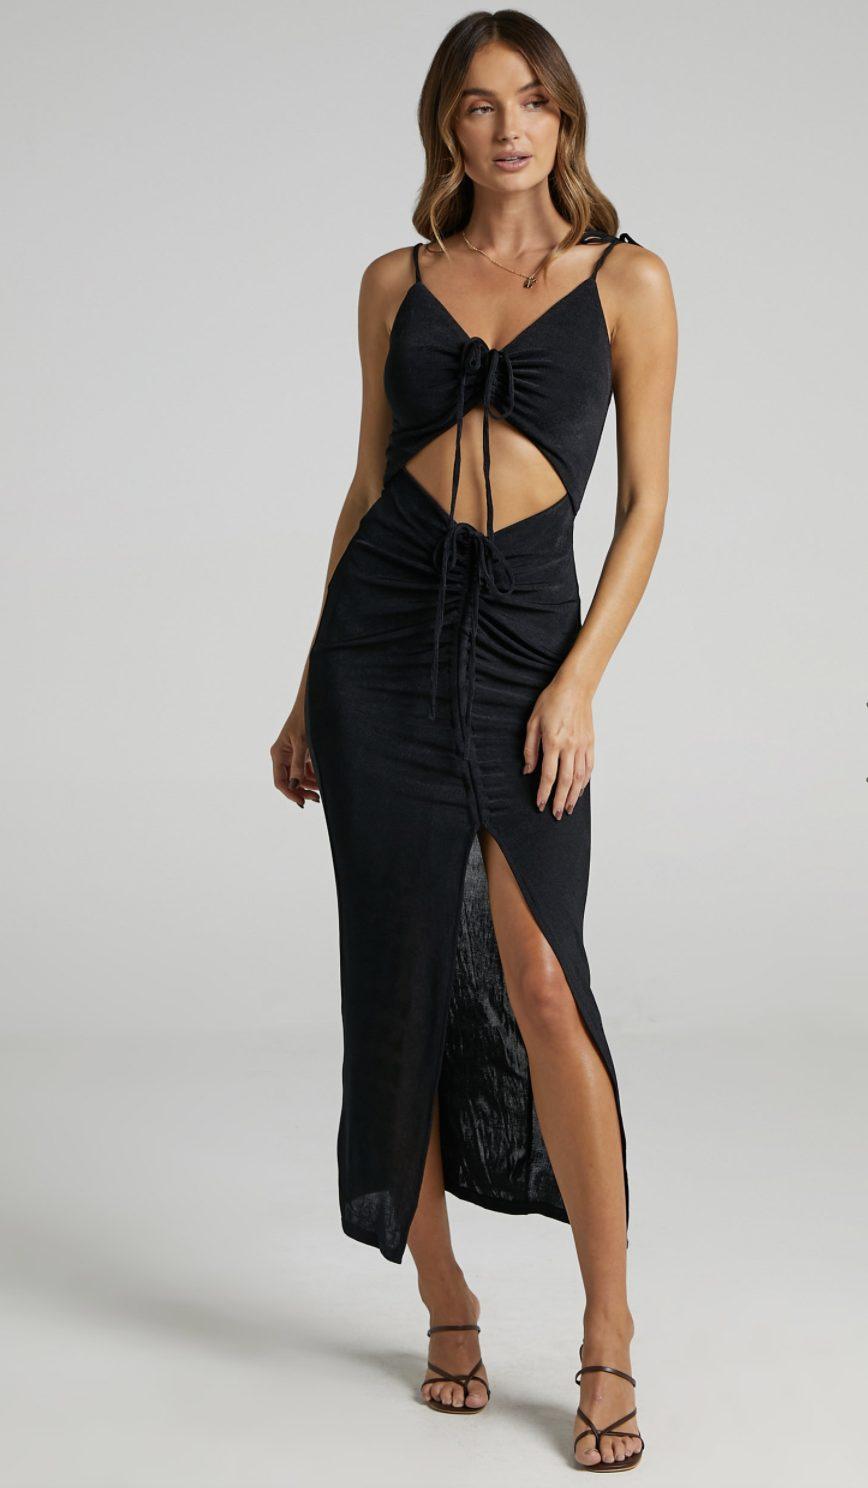 Black cut out detail dress